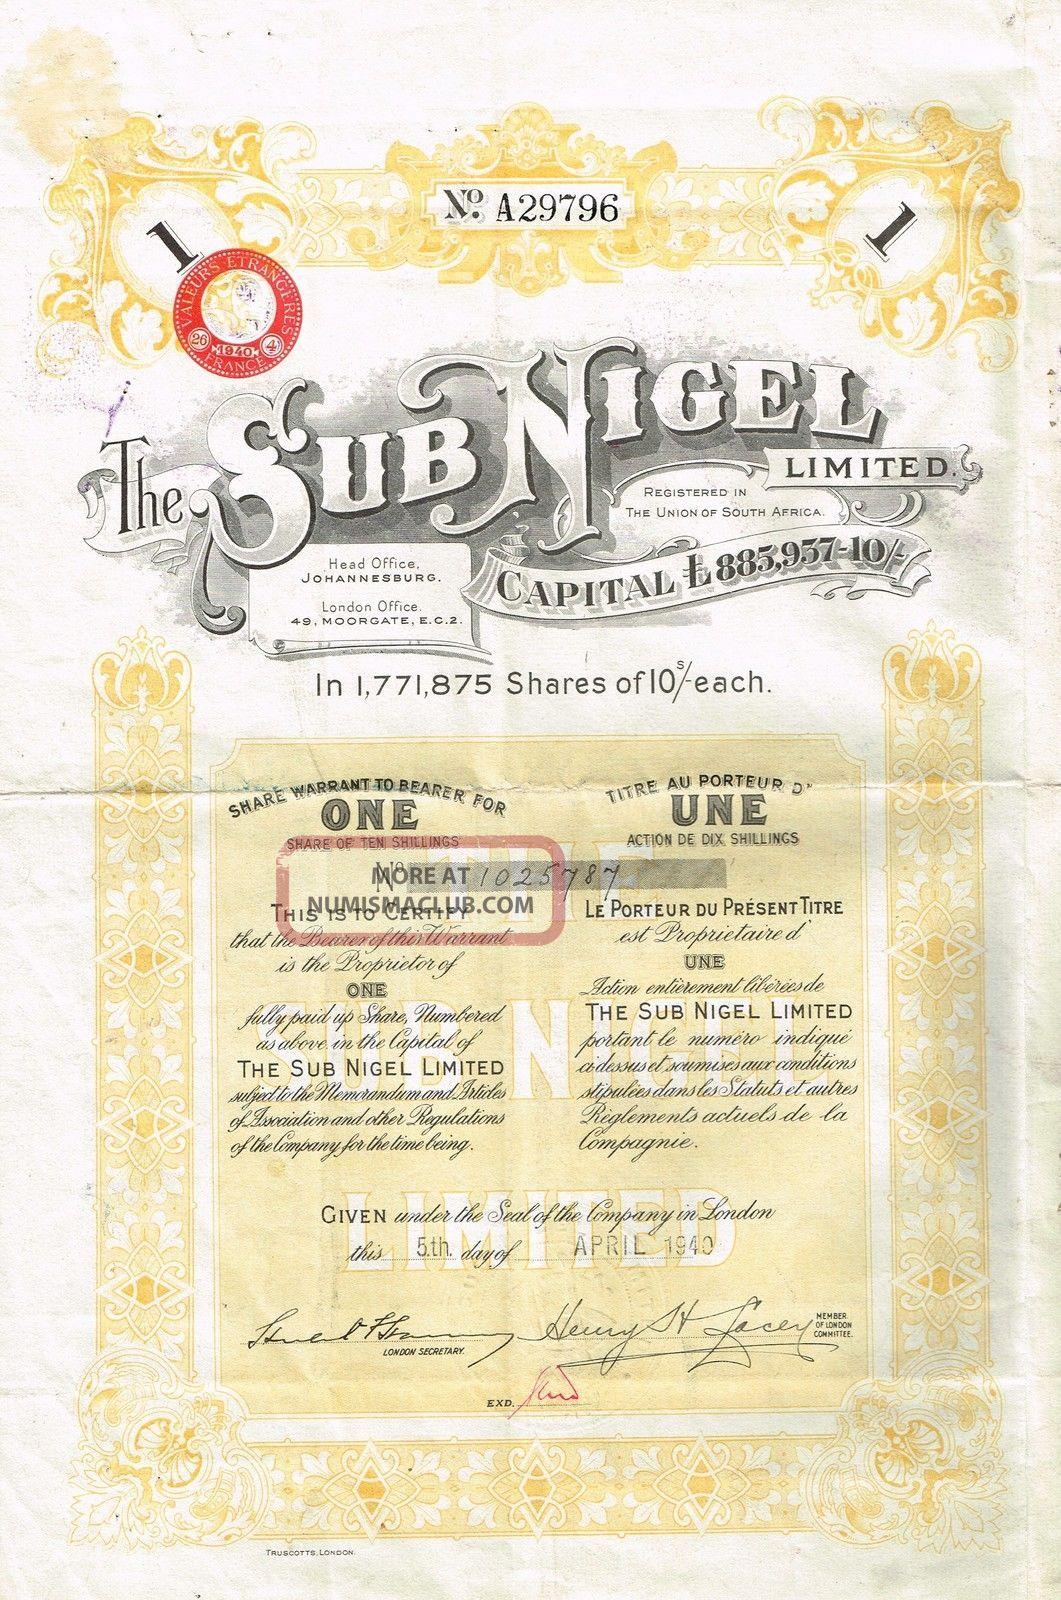 South Africa Sub Nigel Gold Mine Company Stock Certificate World photo